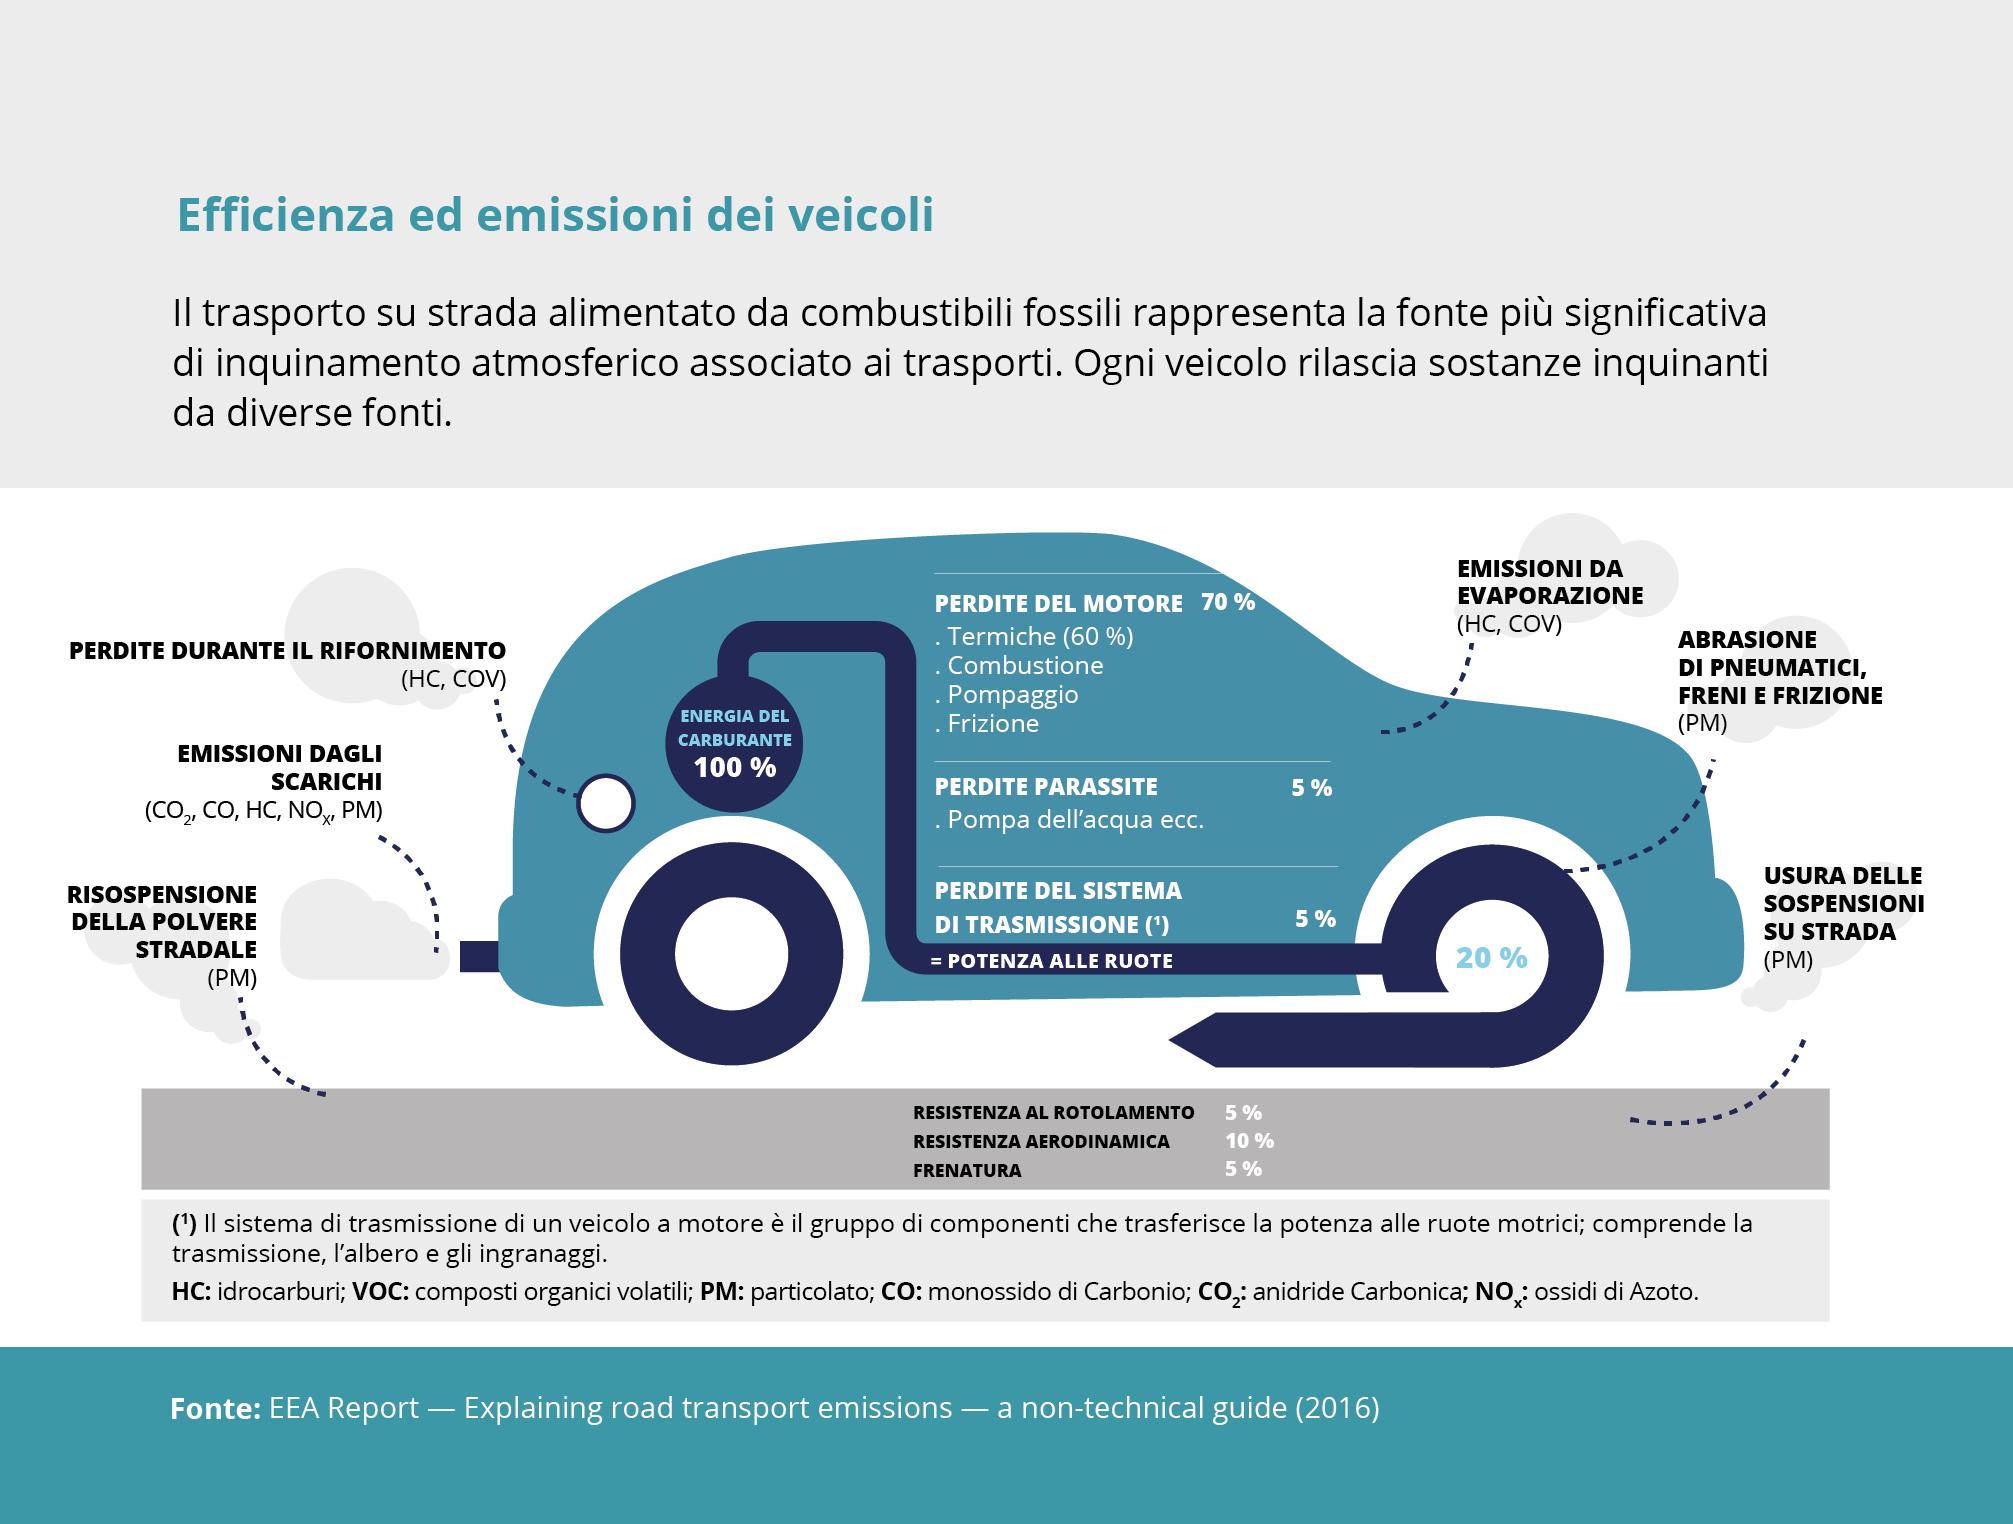 Efficienza ed emissioni dei veicoli